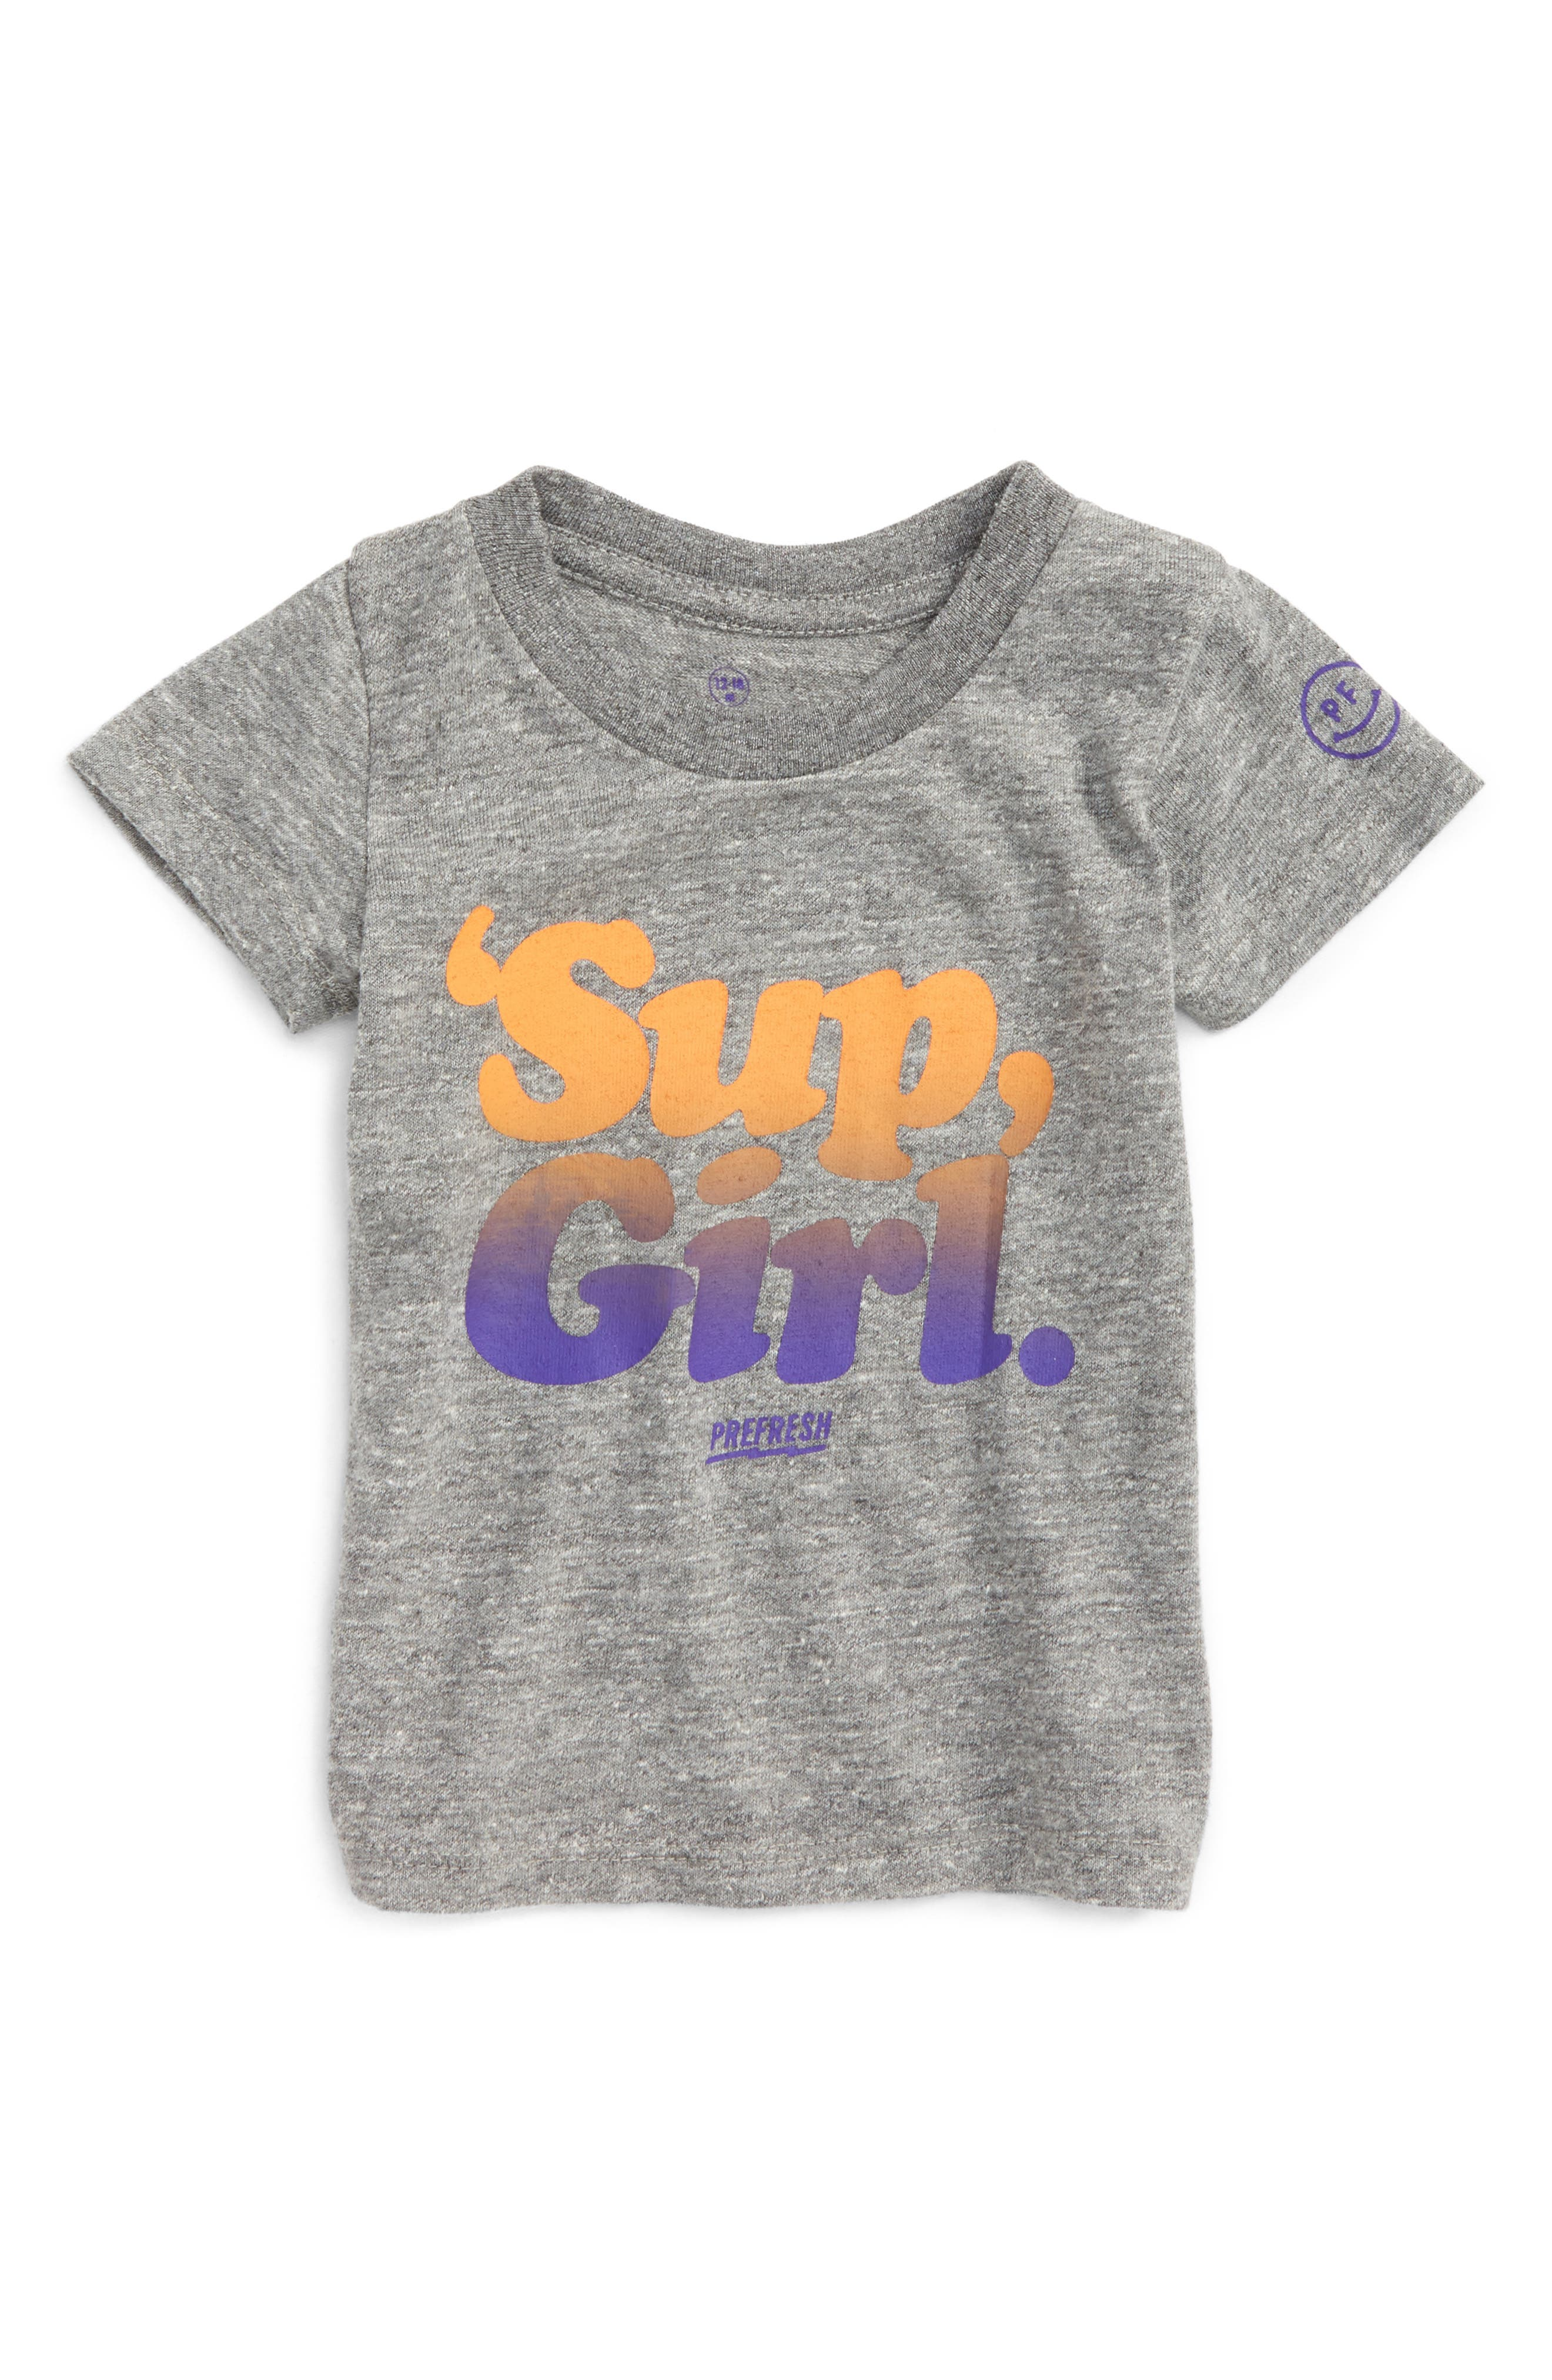 'Sup, Girl Graphic T-Shirt,                             Main thumbnail 1, color,                             Heather Grey